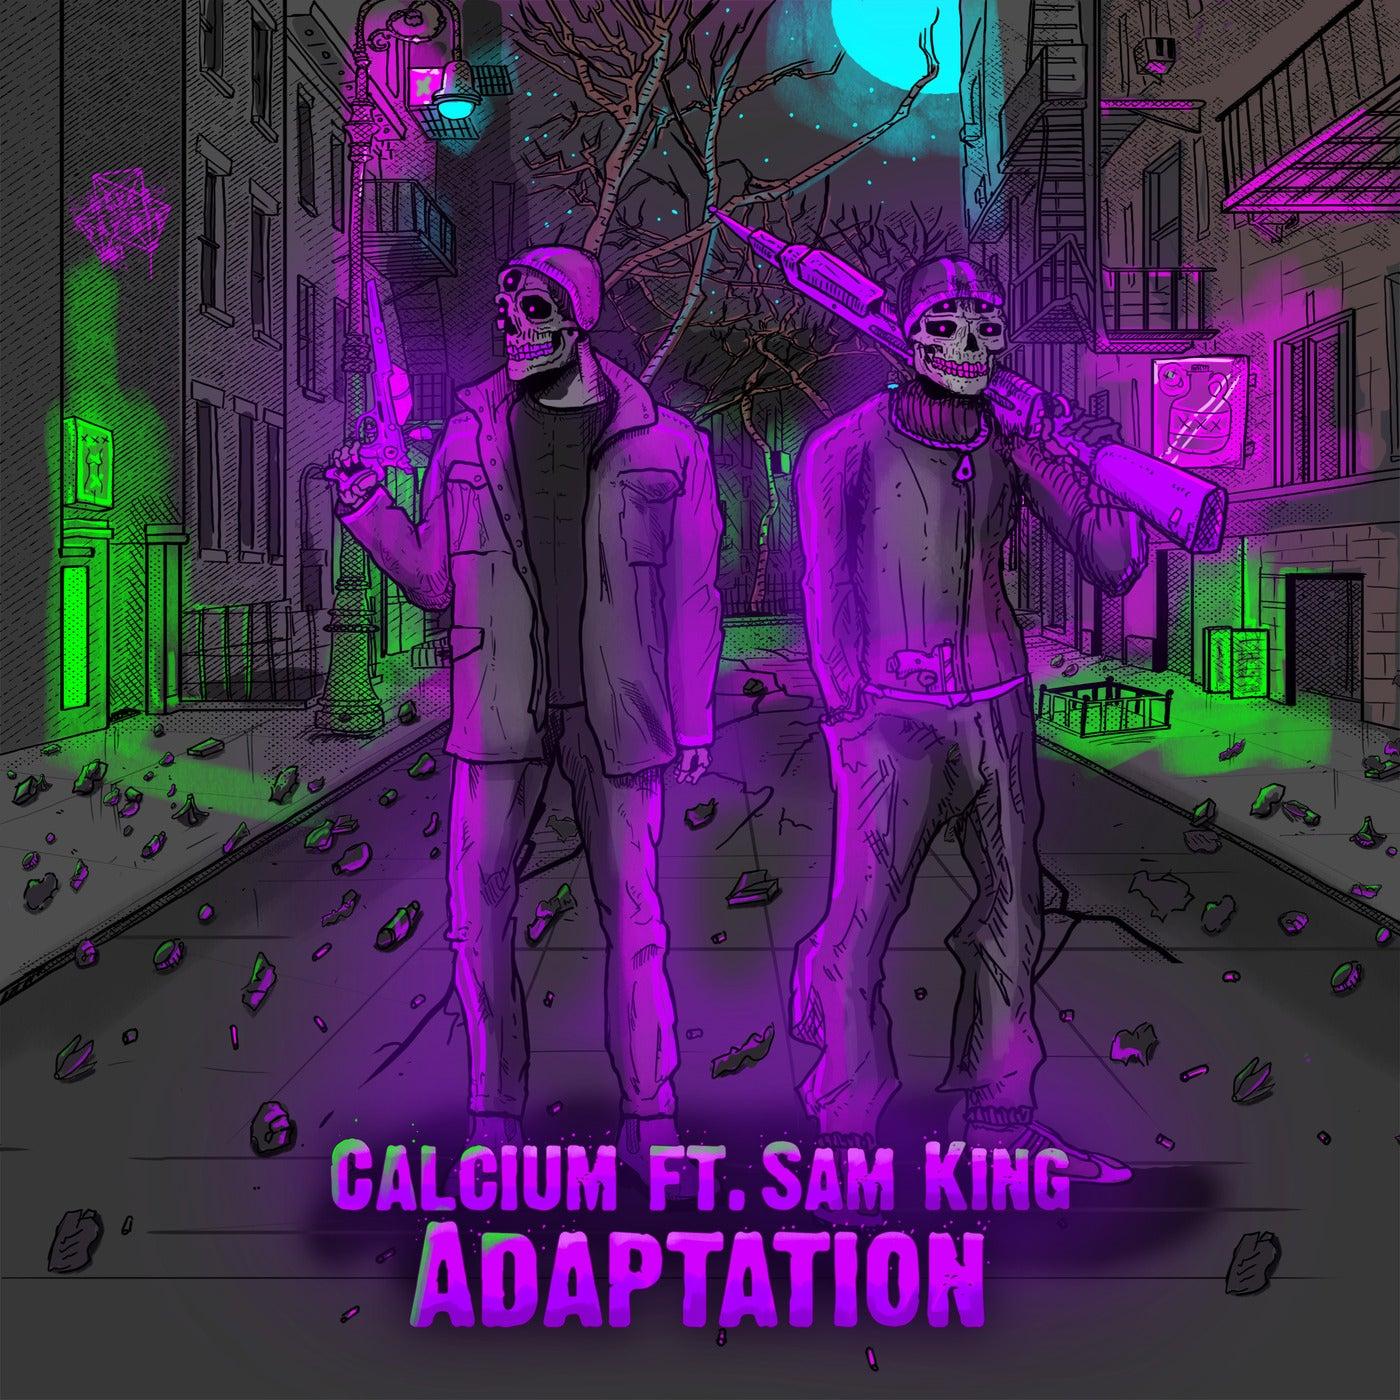 Adaptation feat. Sam King (Original Mix)